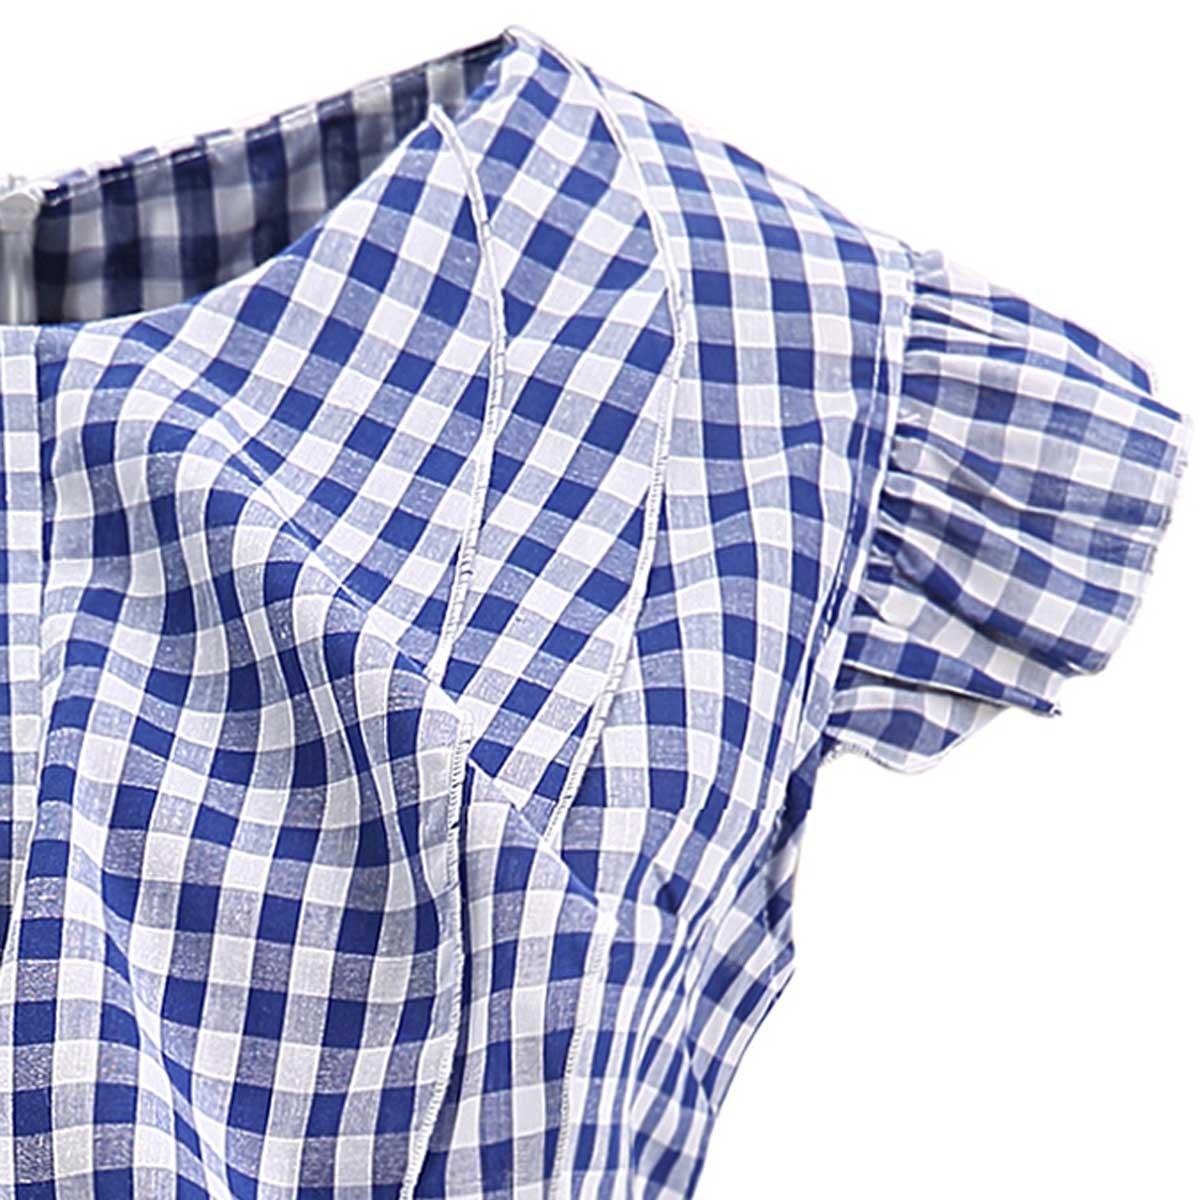 68b316a2fa4308 AOMEI Women Sleeveless Plaid Blouses Ruffles Vintage Gingham Peplum Top  Shirts at Amazon Women's Clothing store: